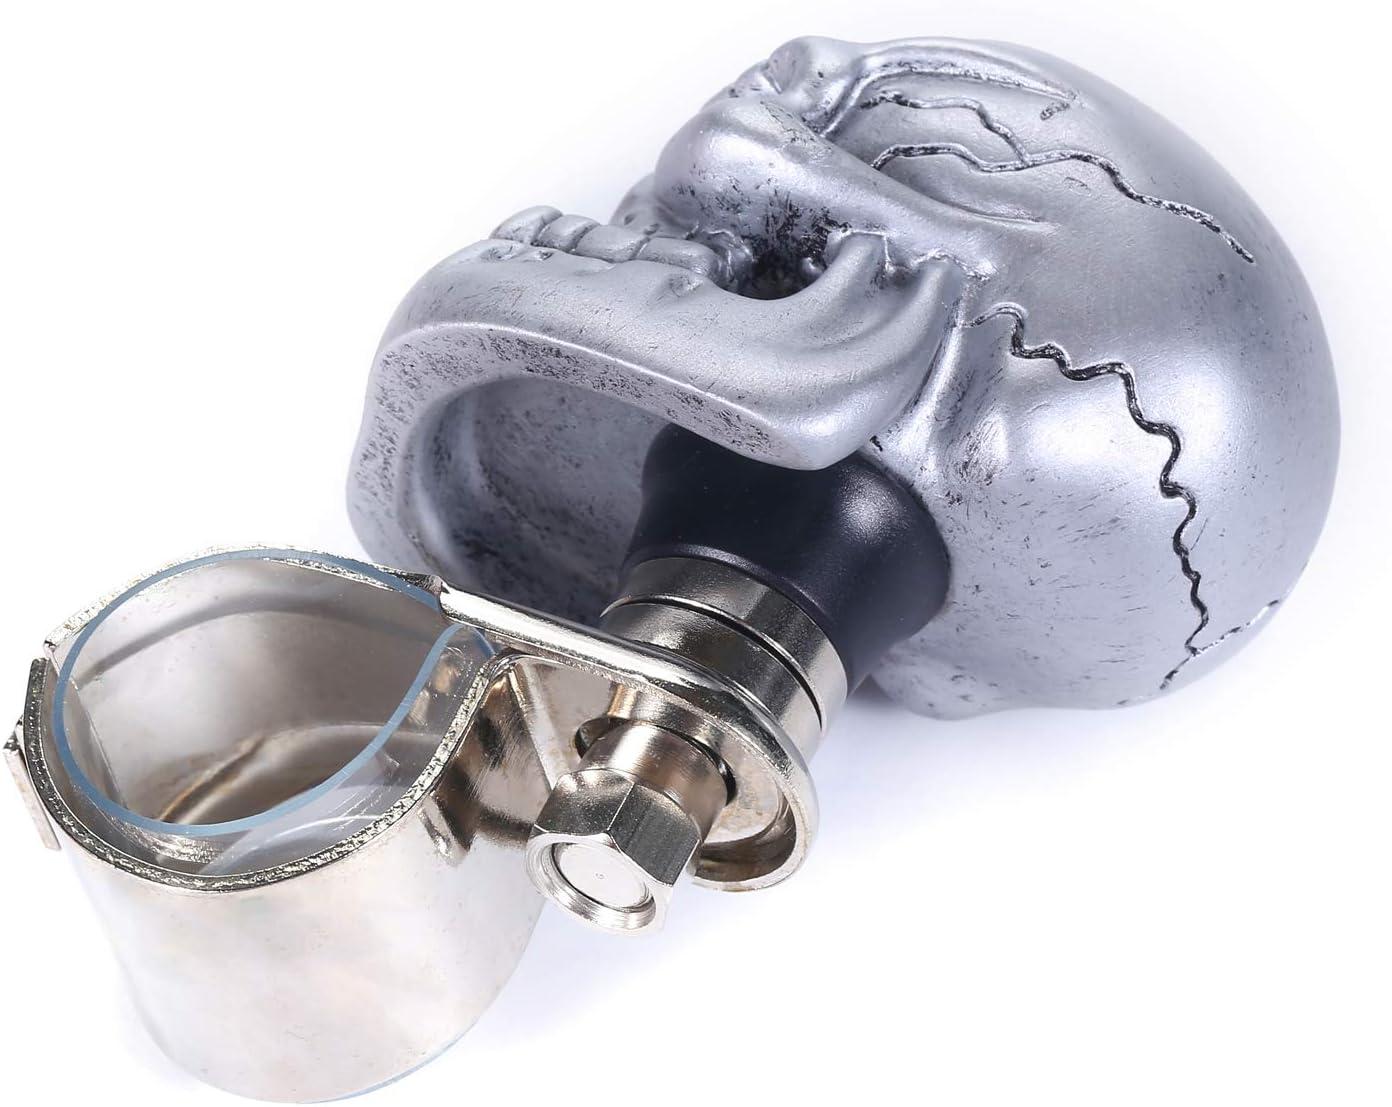 Beige Bashineng Power Handle Spinner Skull Car Assist Ball Steering Wheel Suicide Control Knob